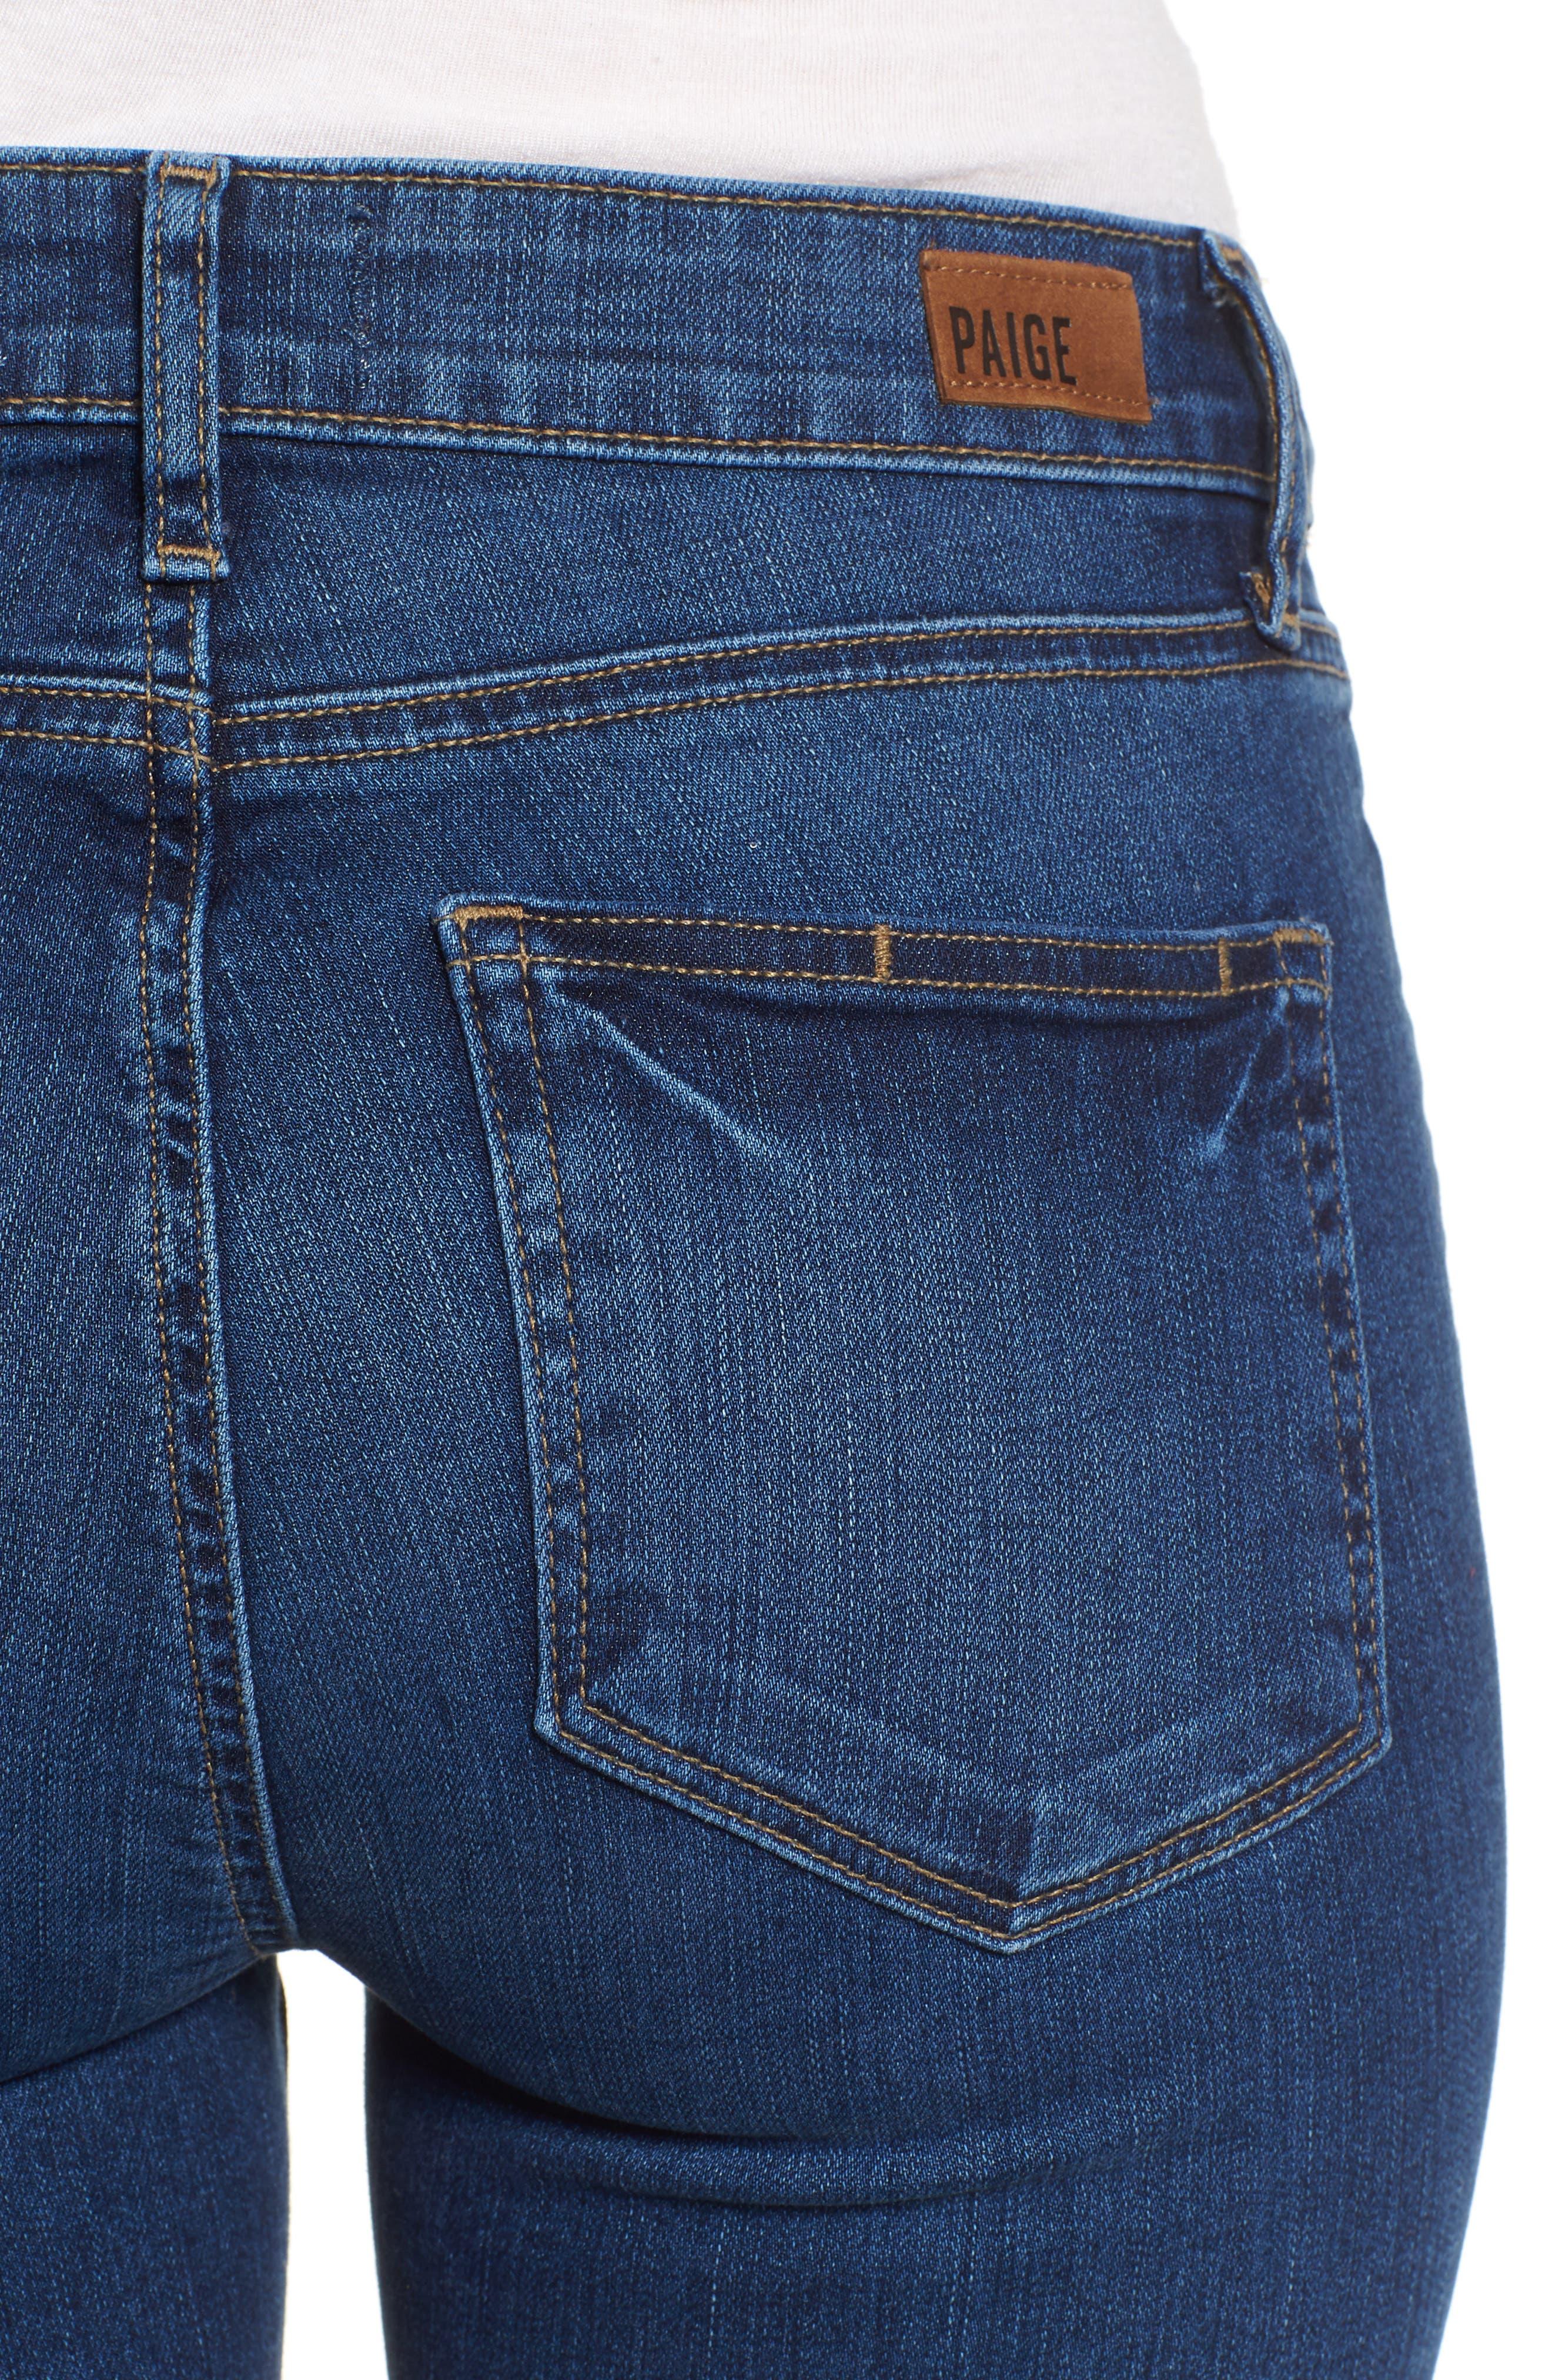 Verdugo Ankle Skinny Jeans,                             Alternate thumbnail 4, color,                             Salida